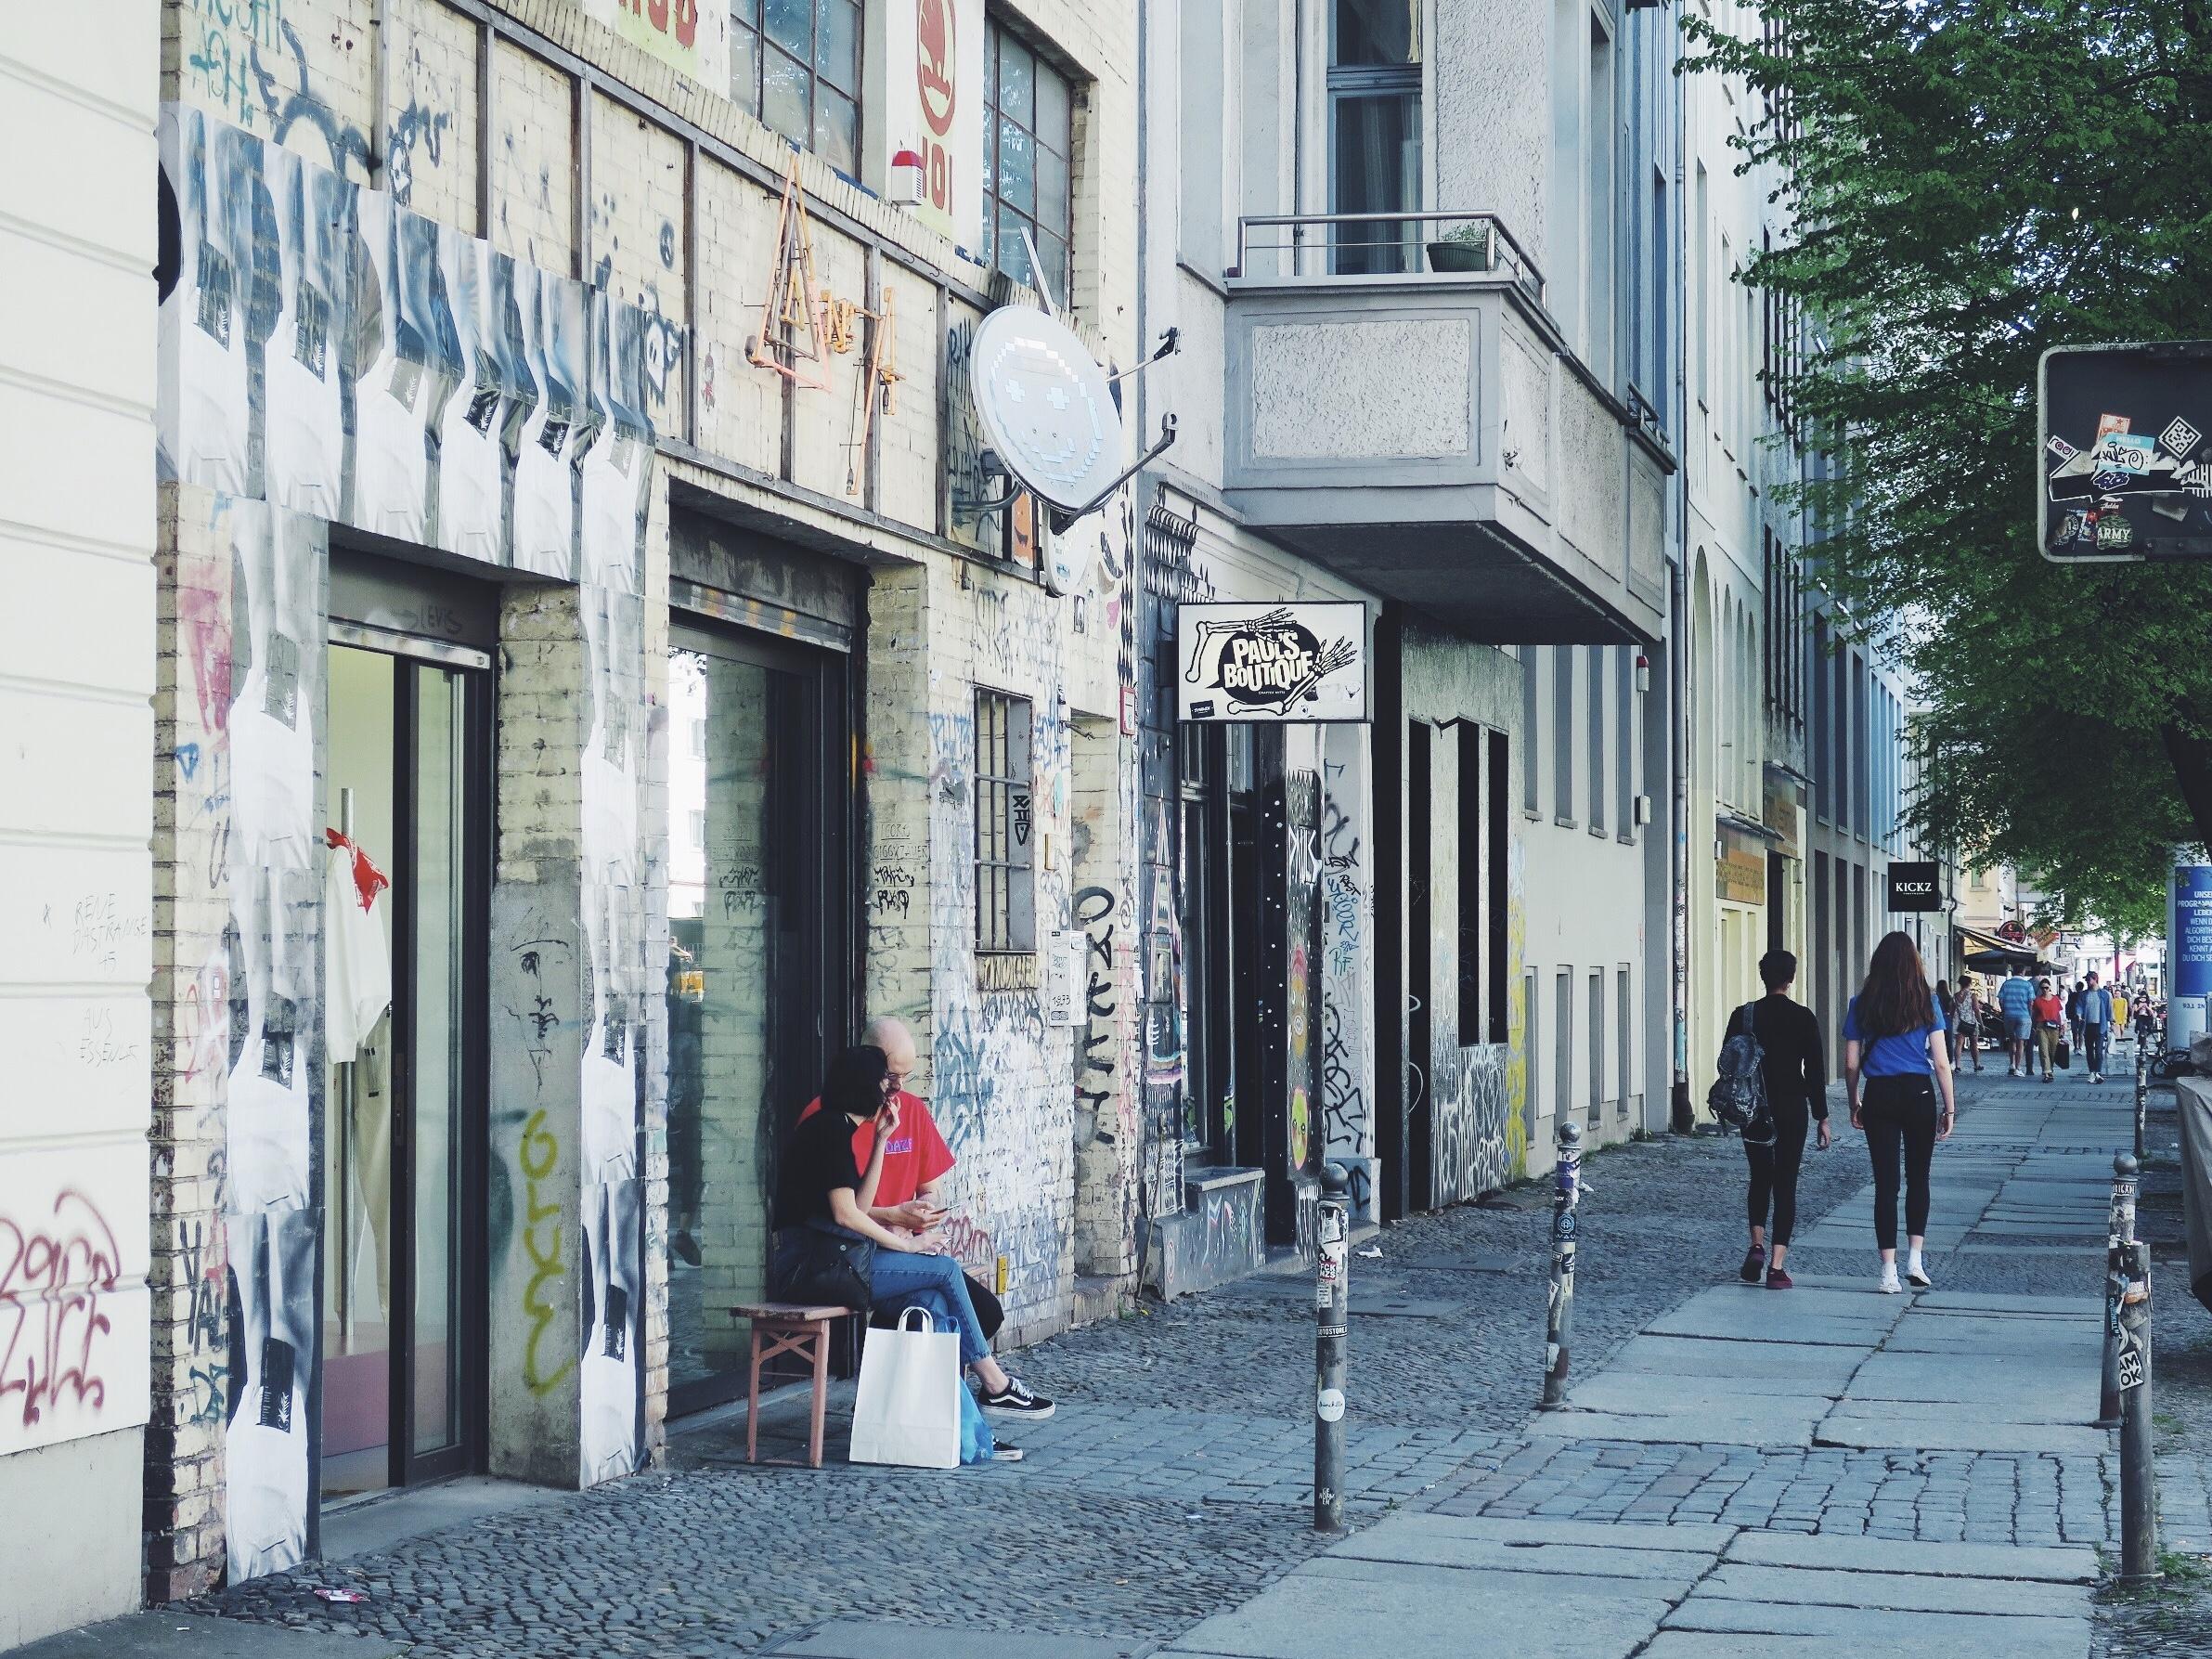 No74,Torstraße 74